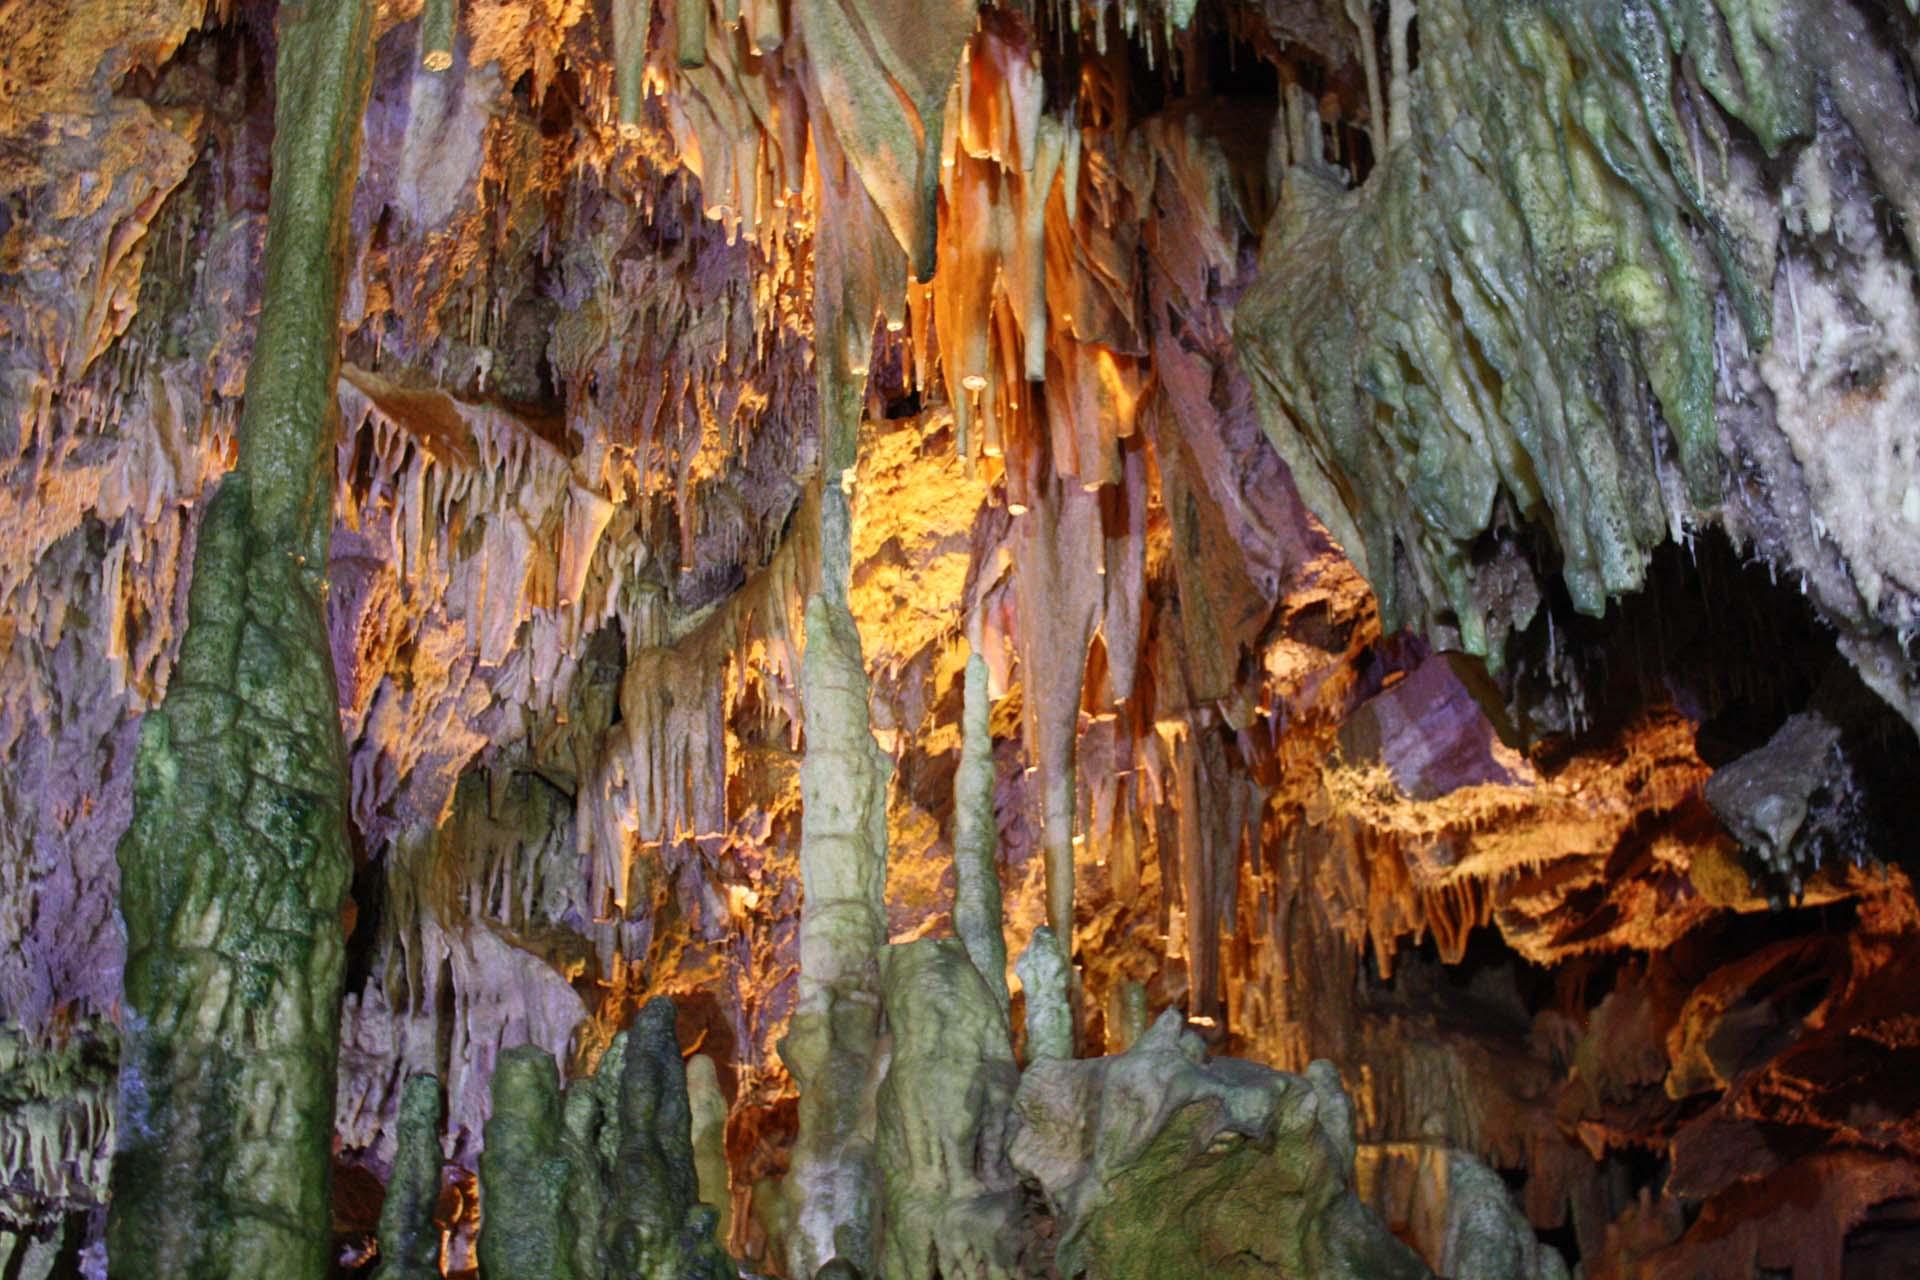 Colourful rocks in Dyros caves